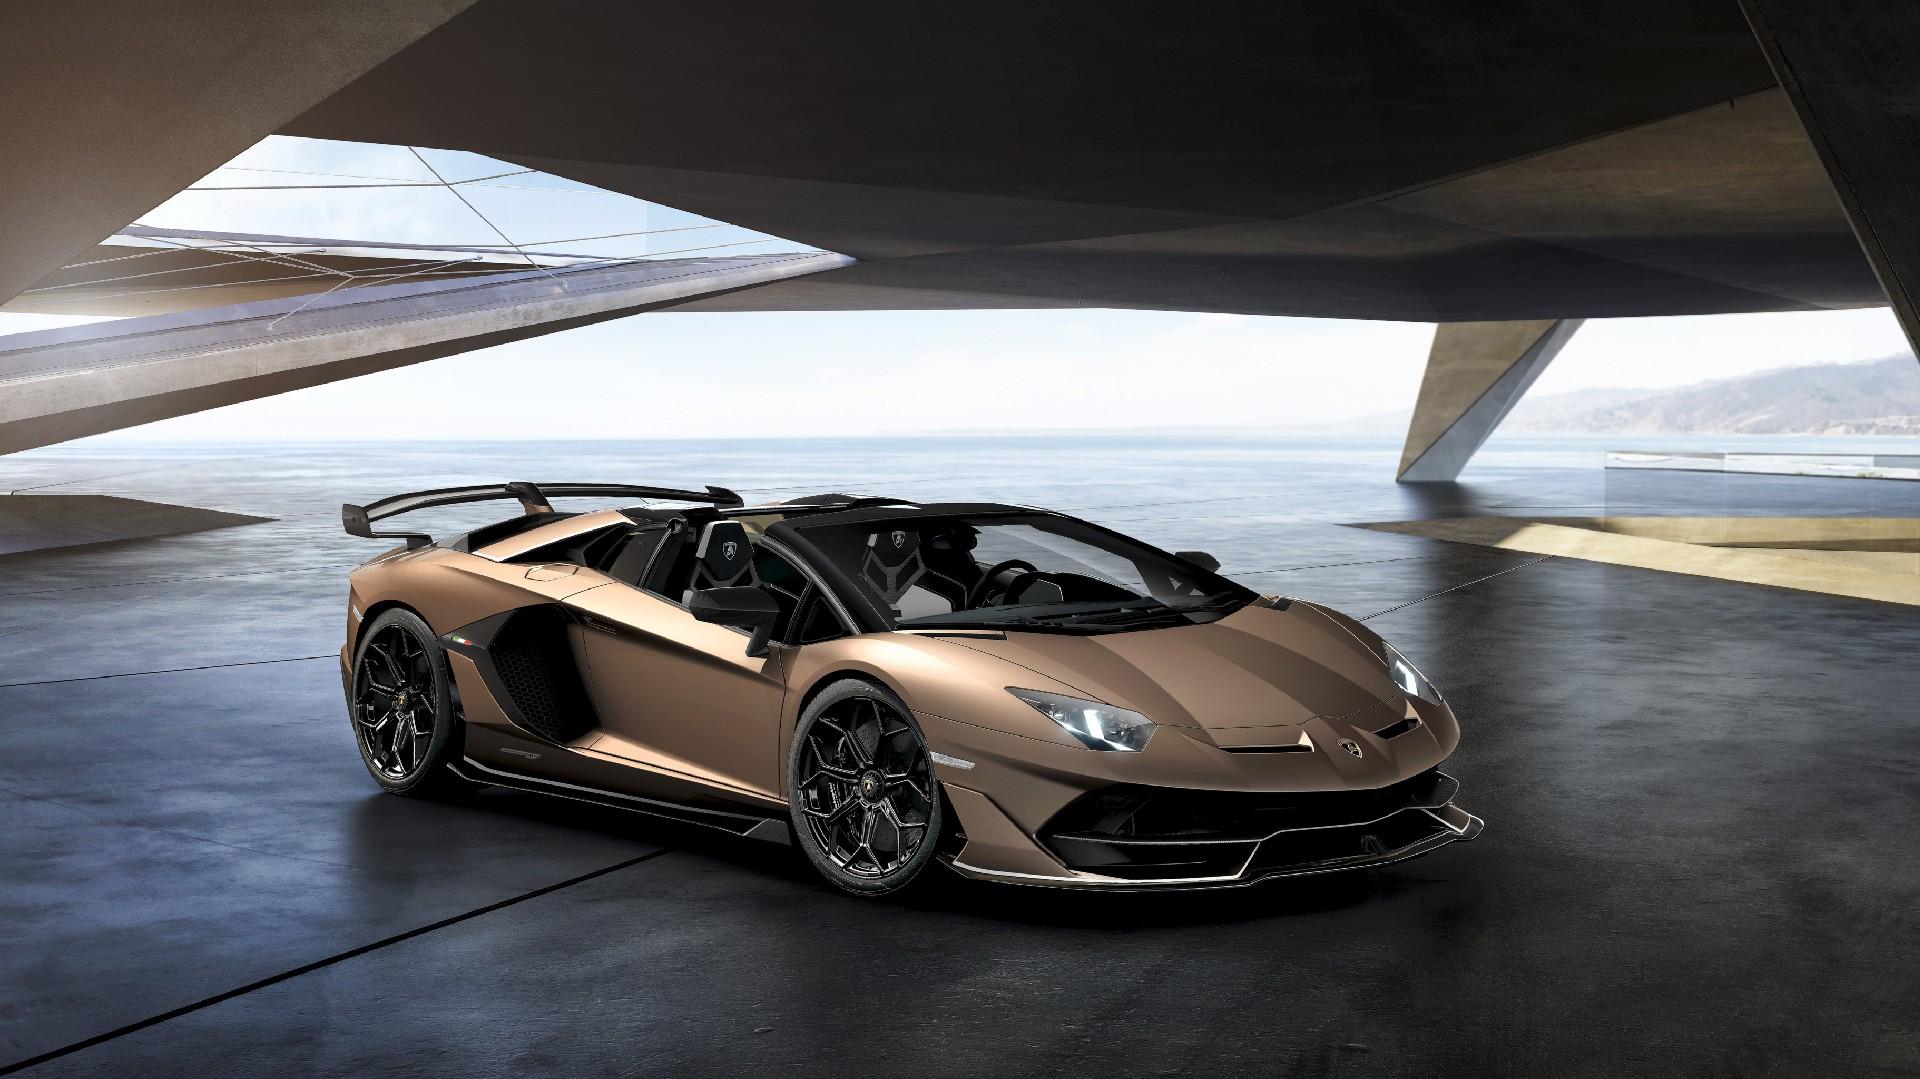 Lamborghini Aventador Svj Hd Wallpaper Backiee Free Ultra Hd